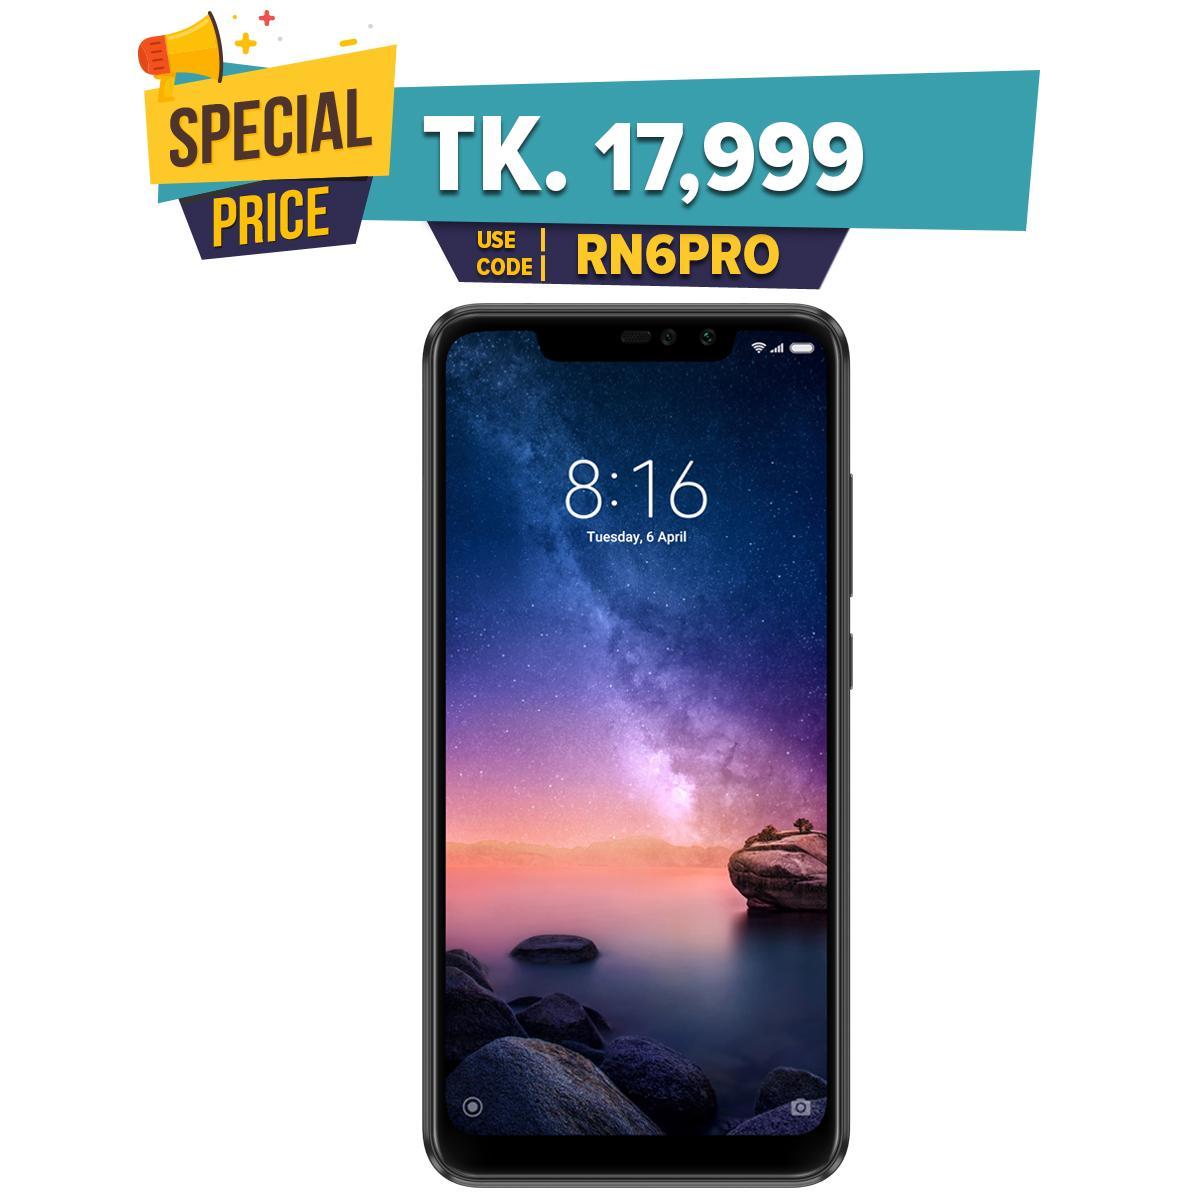 Xiaomi Mobile Phone In Bangladesh At Best Price Redmi 4x 2gb 16gb Gold Note 6 Pro Smartphone 626 Front Camera 20mp 2mp